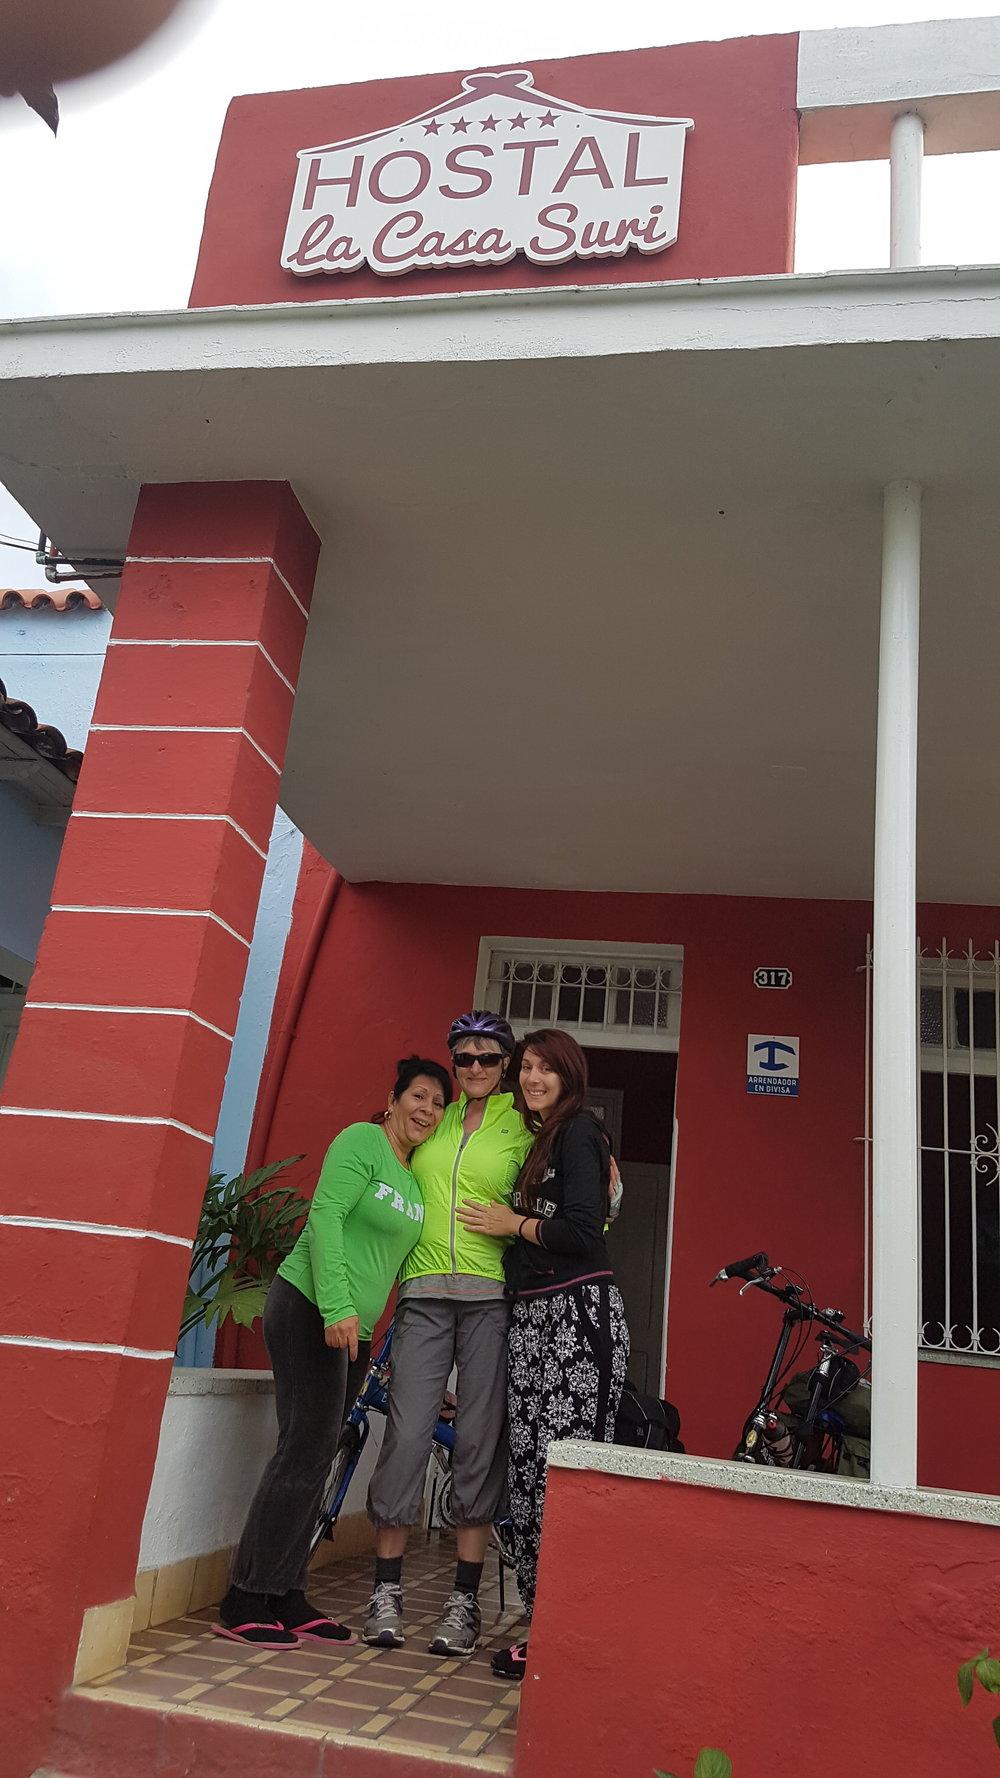 Casa Suri in Santa Clara. Lovely spot, highly recommended.